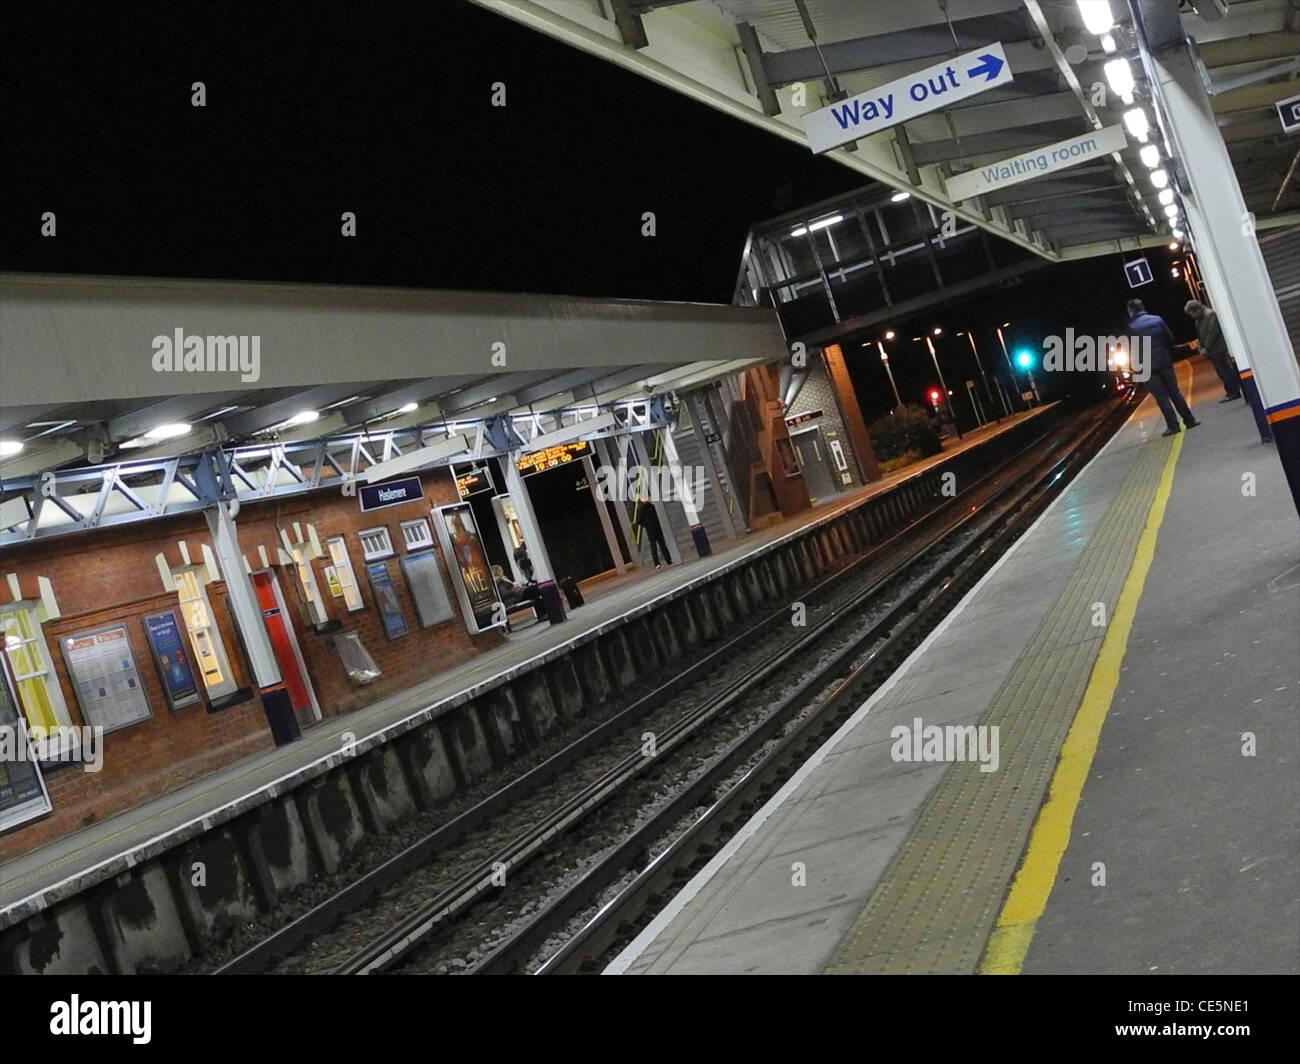 Passengers arriving on UK railway platform station EDITORIAL USE ONLY - Stock Image